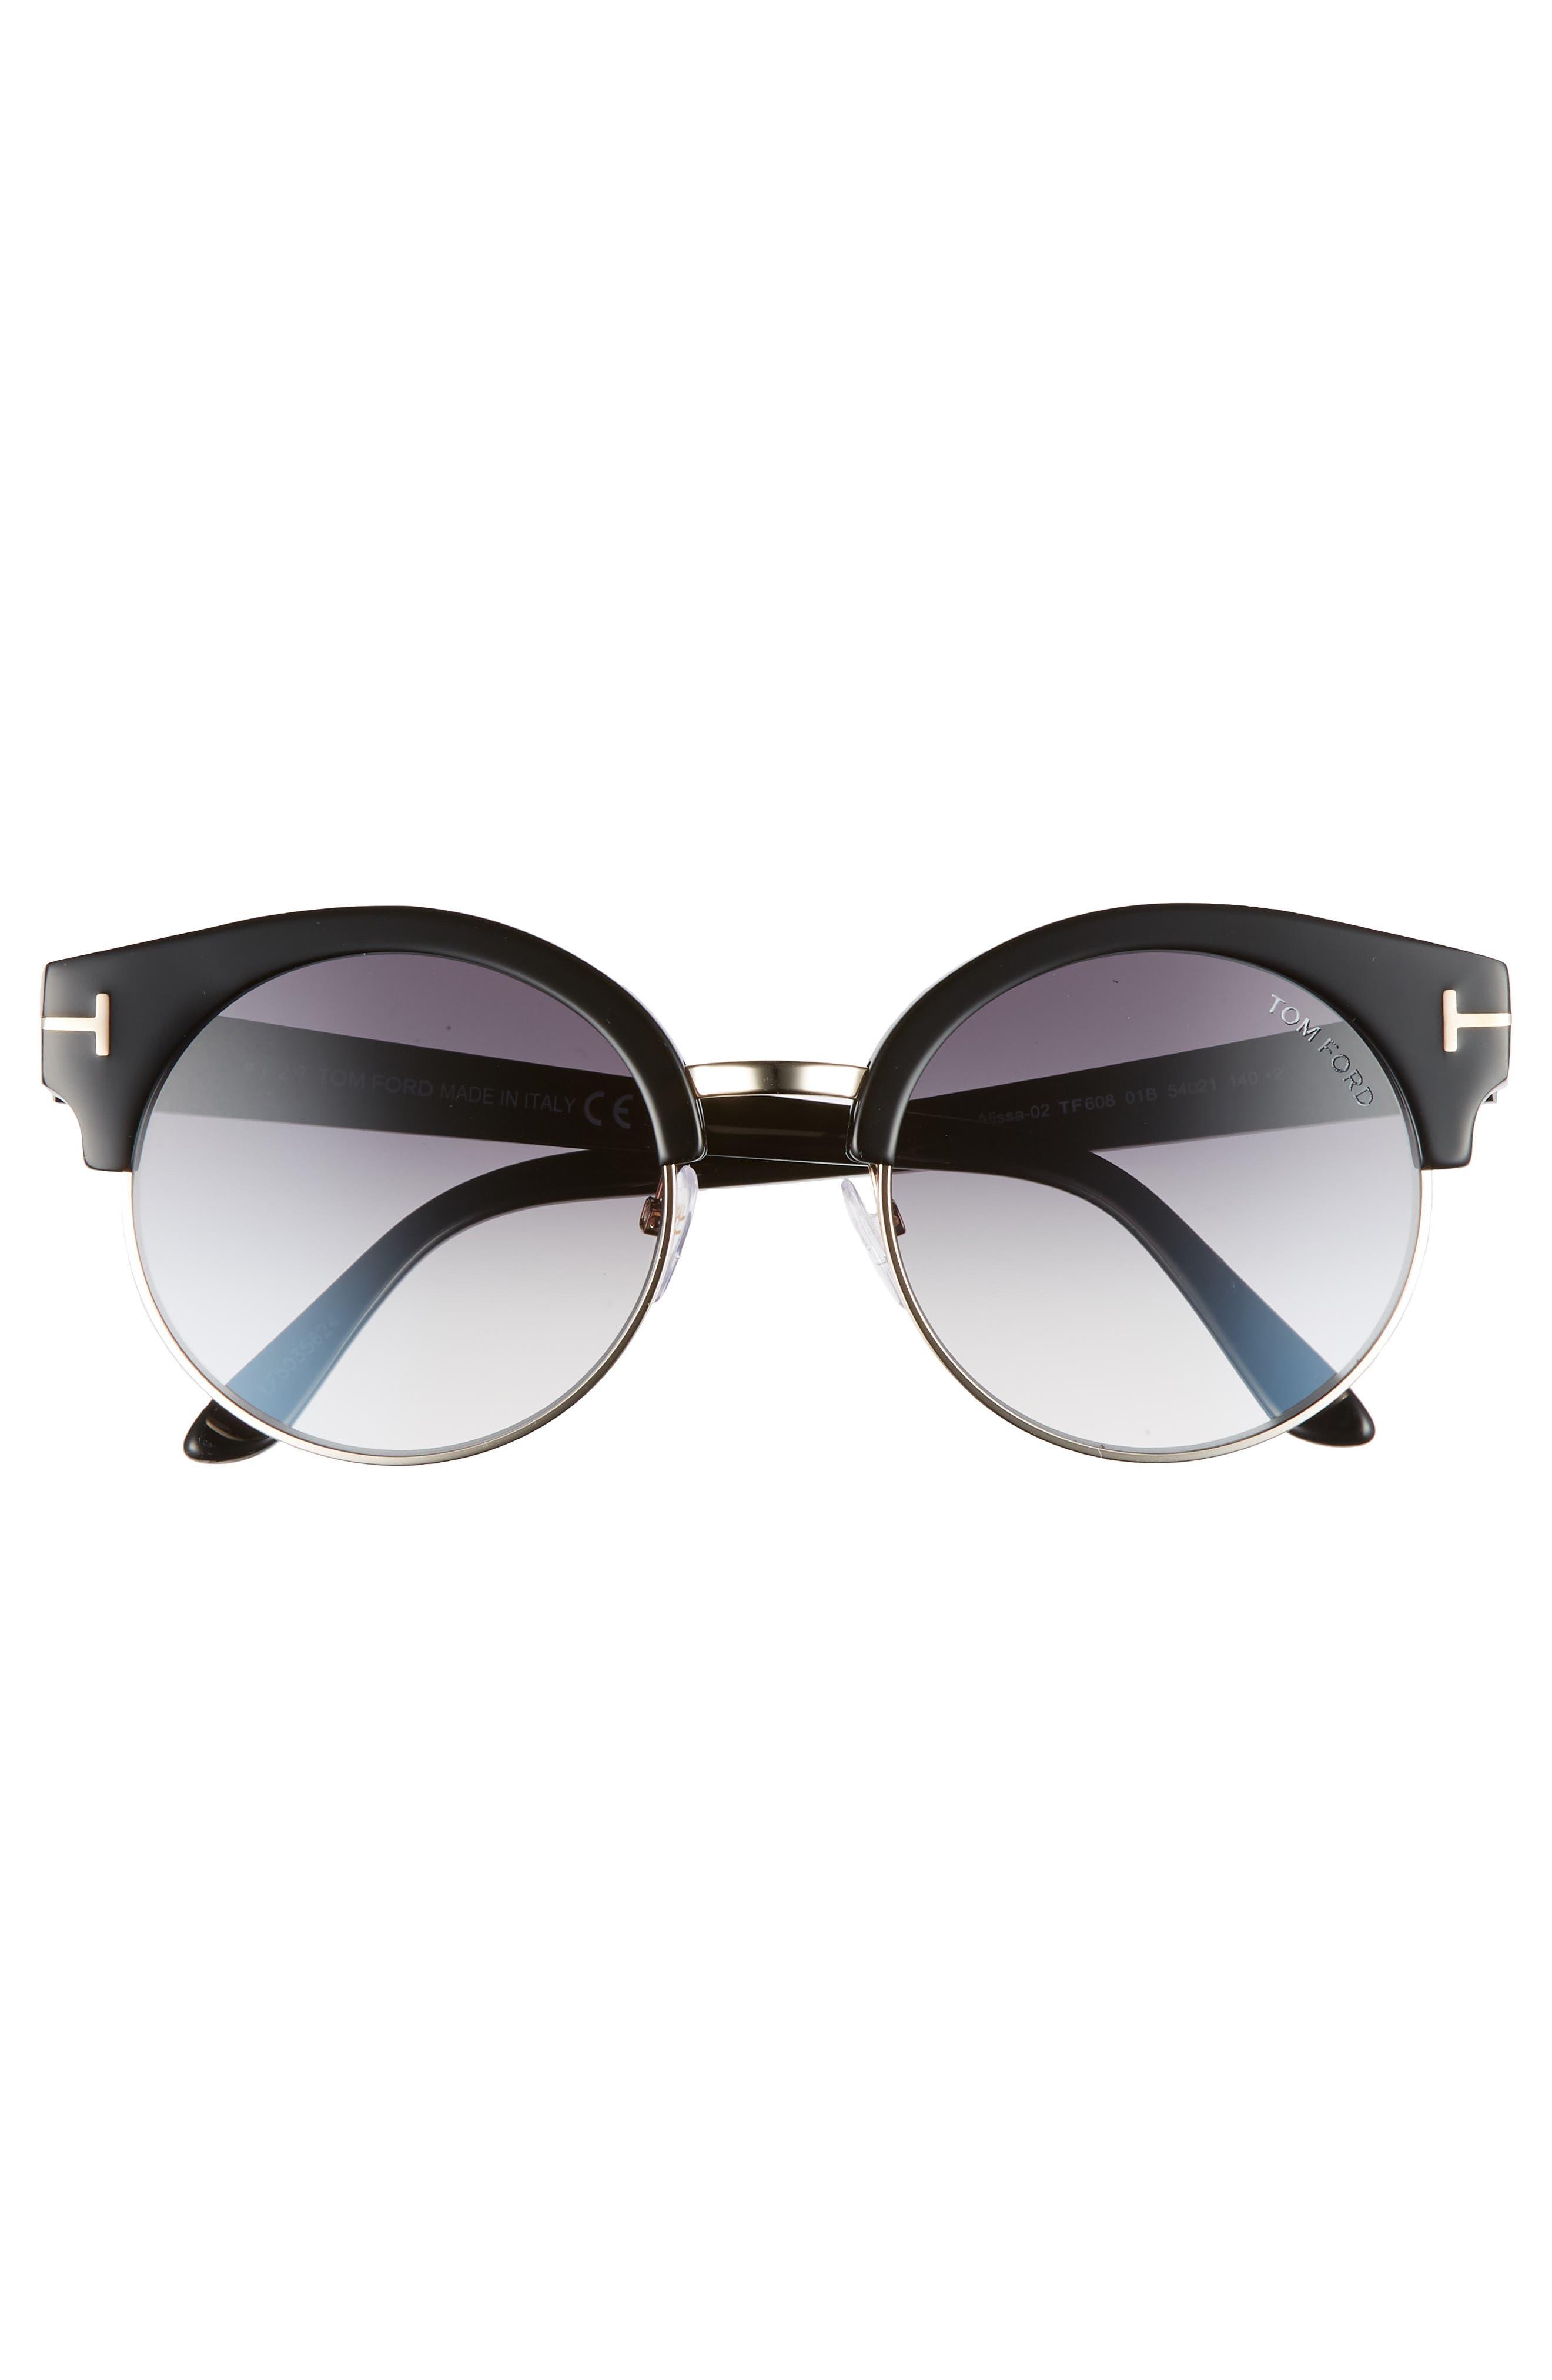 Alissa 54mm Sunglasses,                             Alternate thumbnail 3, color,                             012